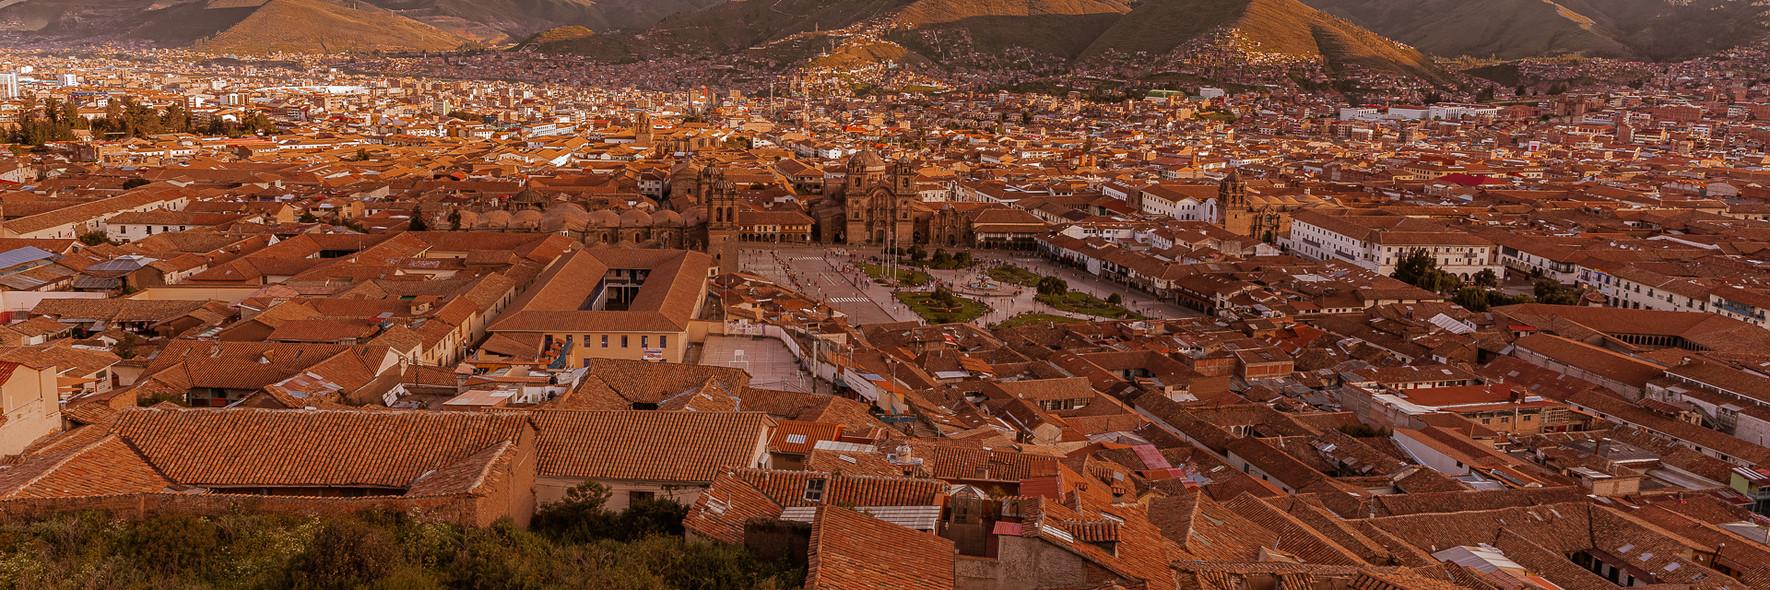 TKPA-Cusco201802-0010-HDWH.jpg